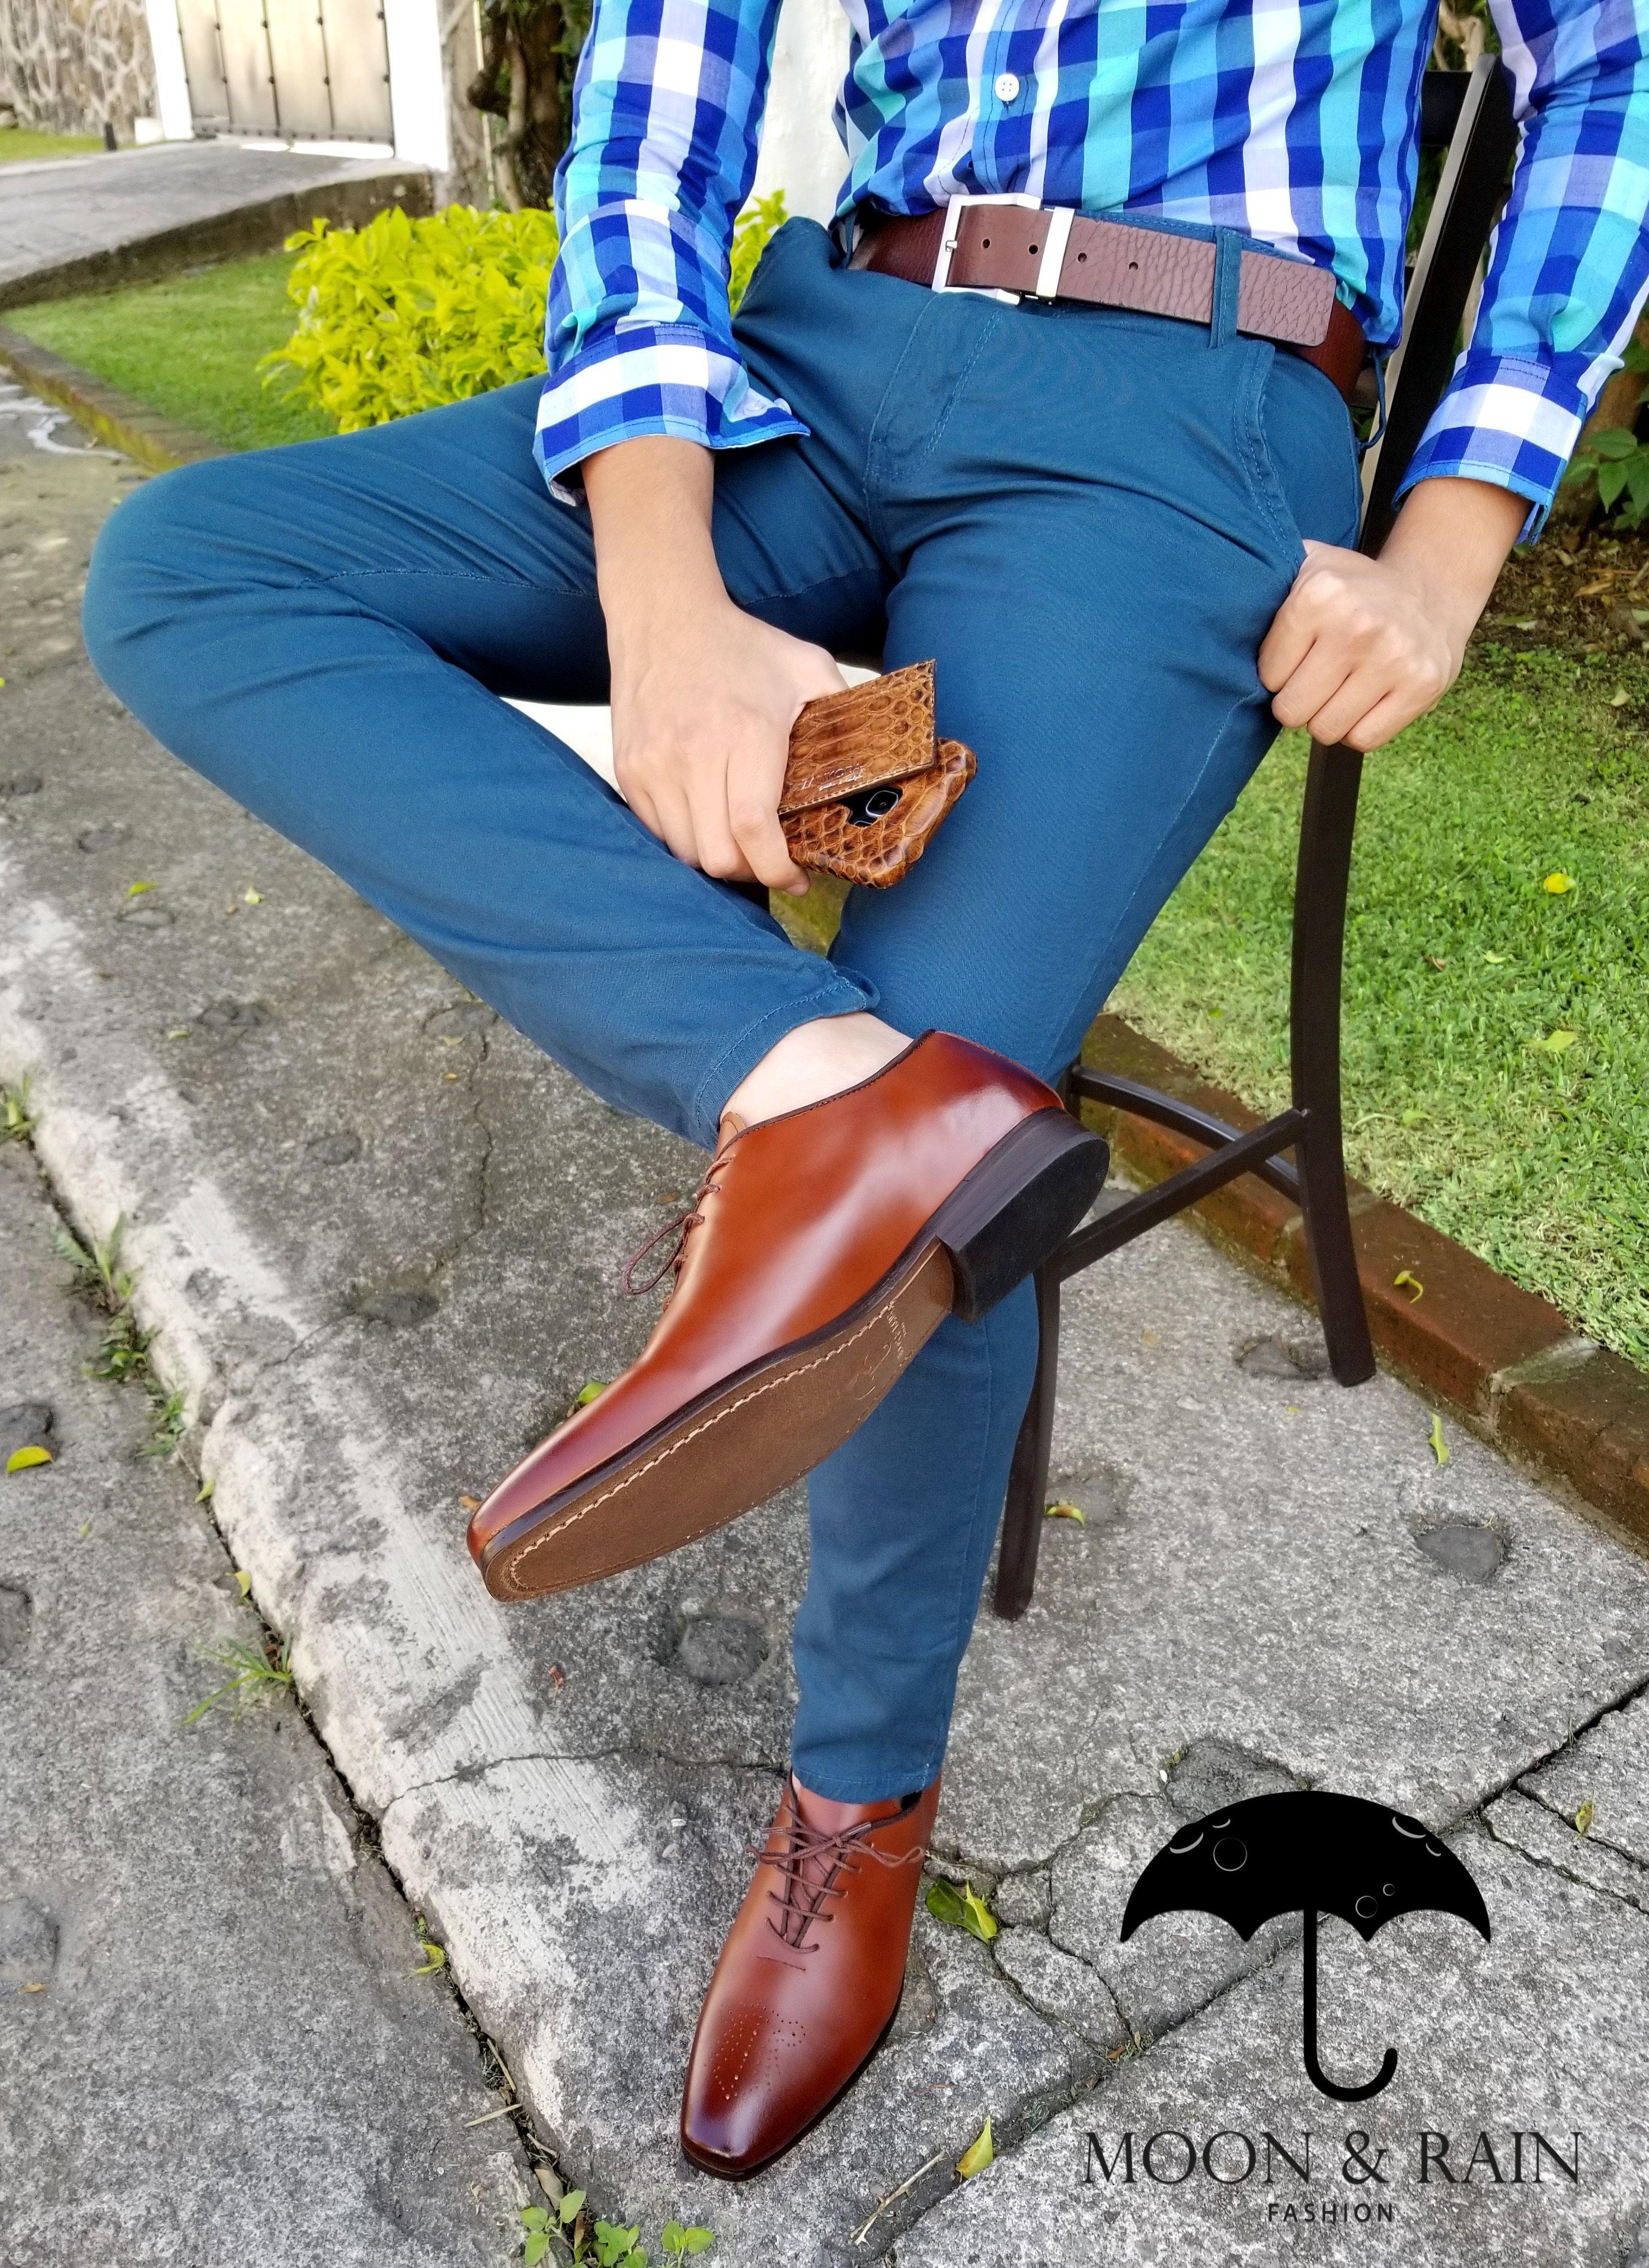 Outfit Para Hombre Camisa Slim Fit De Cuadros Azules Pantalon Skinny De Gabardina Aqua Moca Moda Ropa Hombre Combinar Ropa Hombre Combinacion De Ropa Hombre